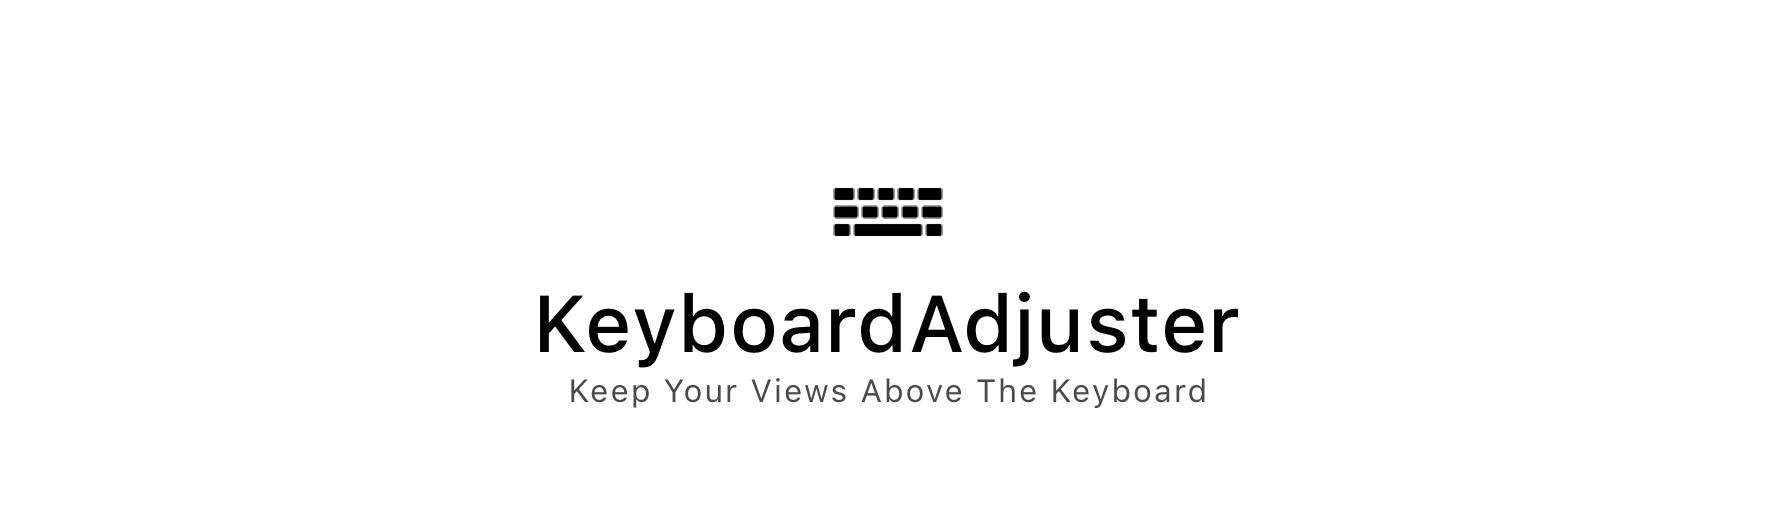 KeyboardAdjuster